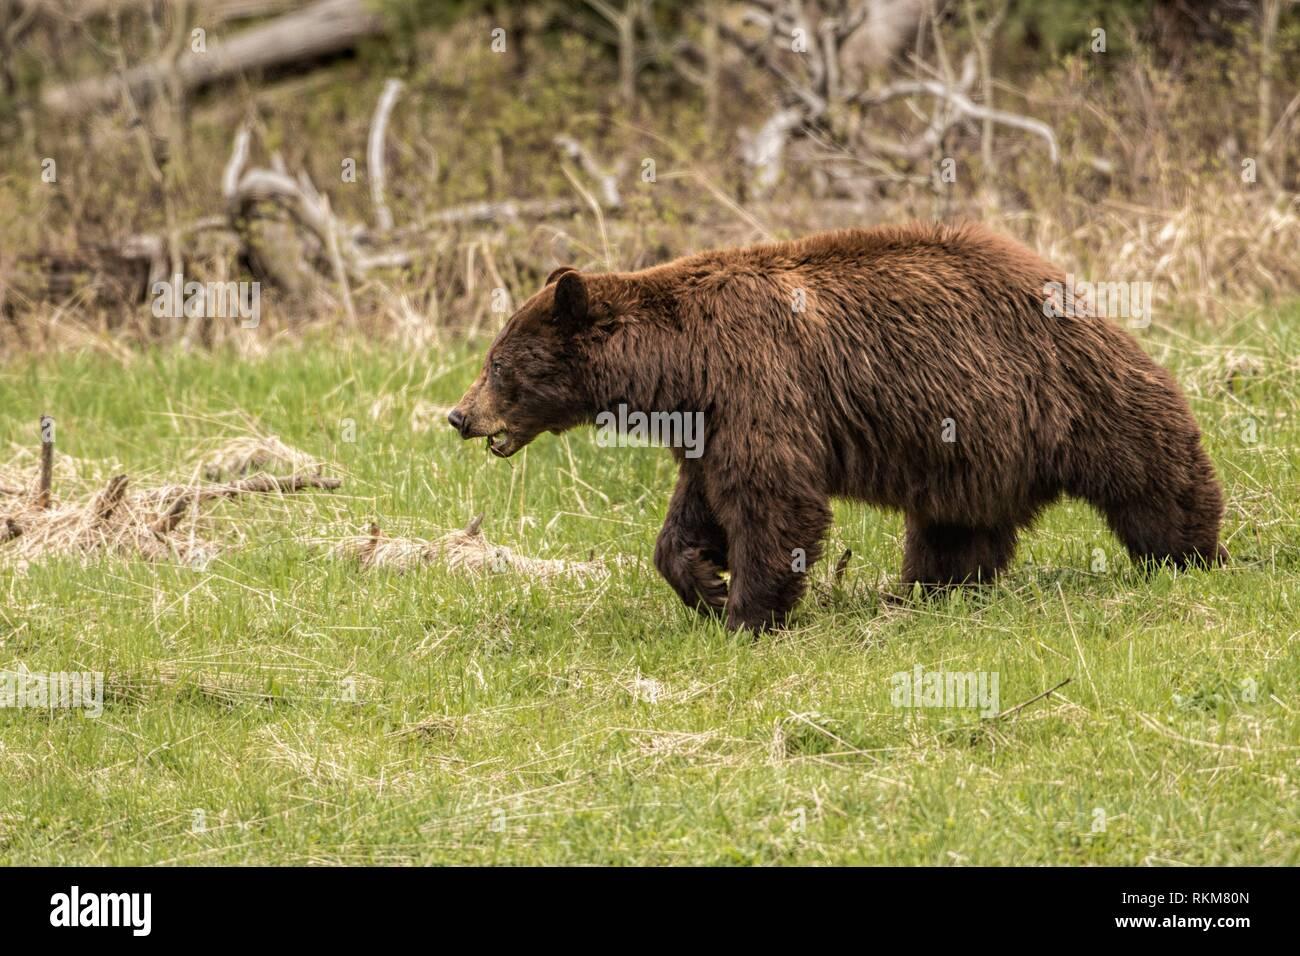 Grizzly bear (Ursus arctos horribilis). Yellowstone National Park, USA - Stock Image